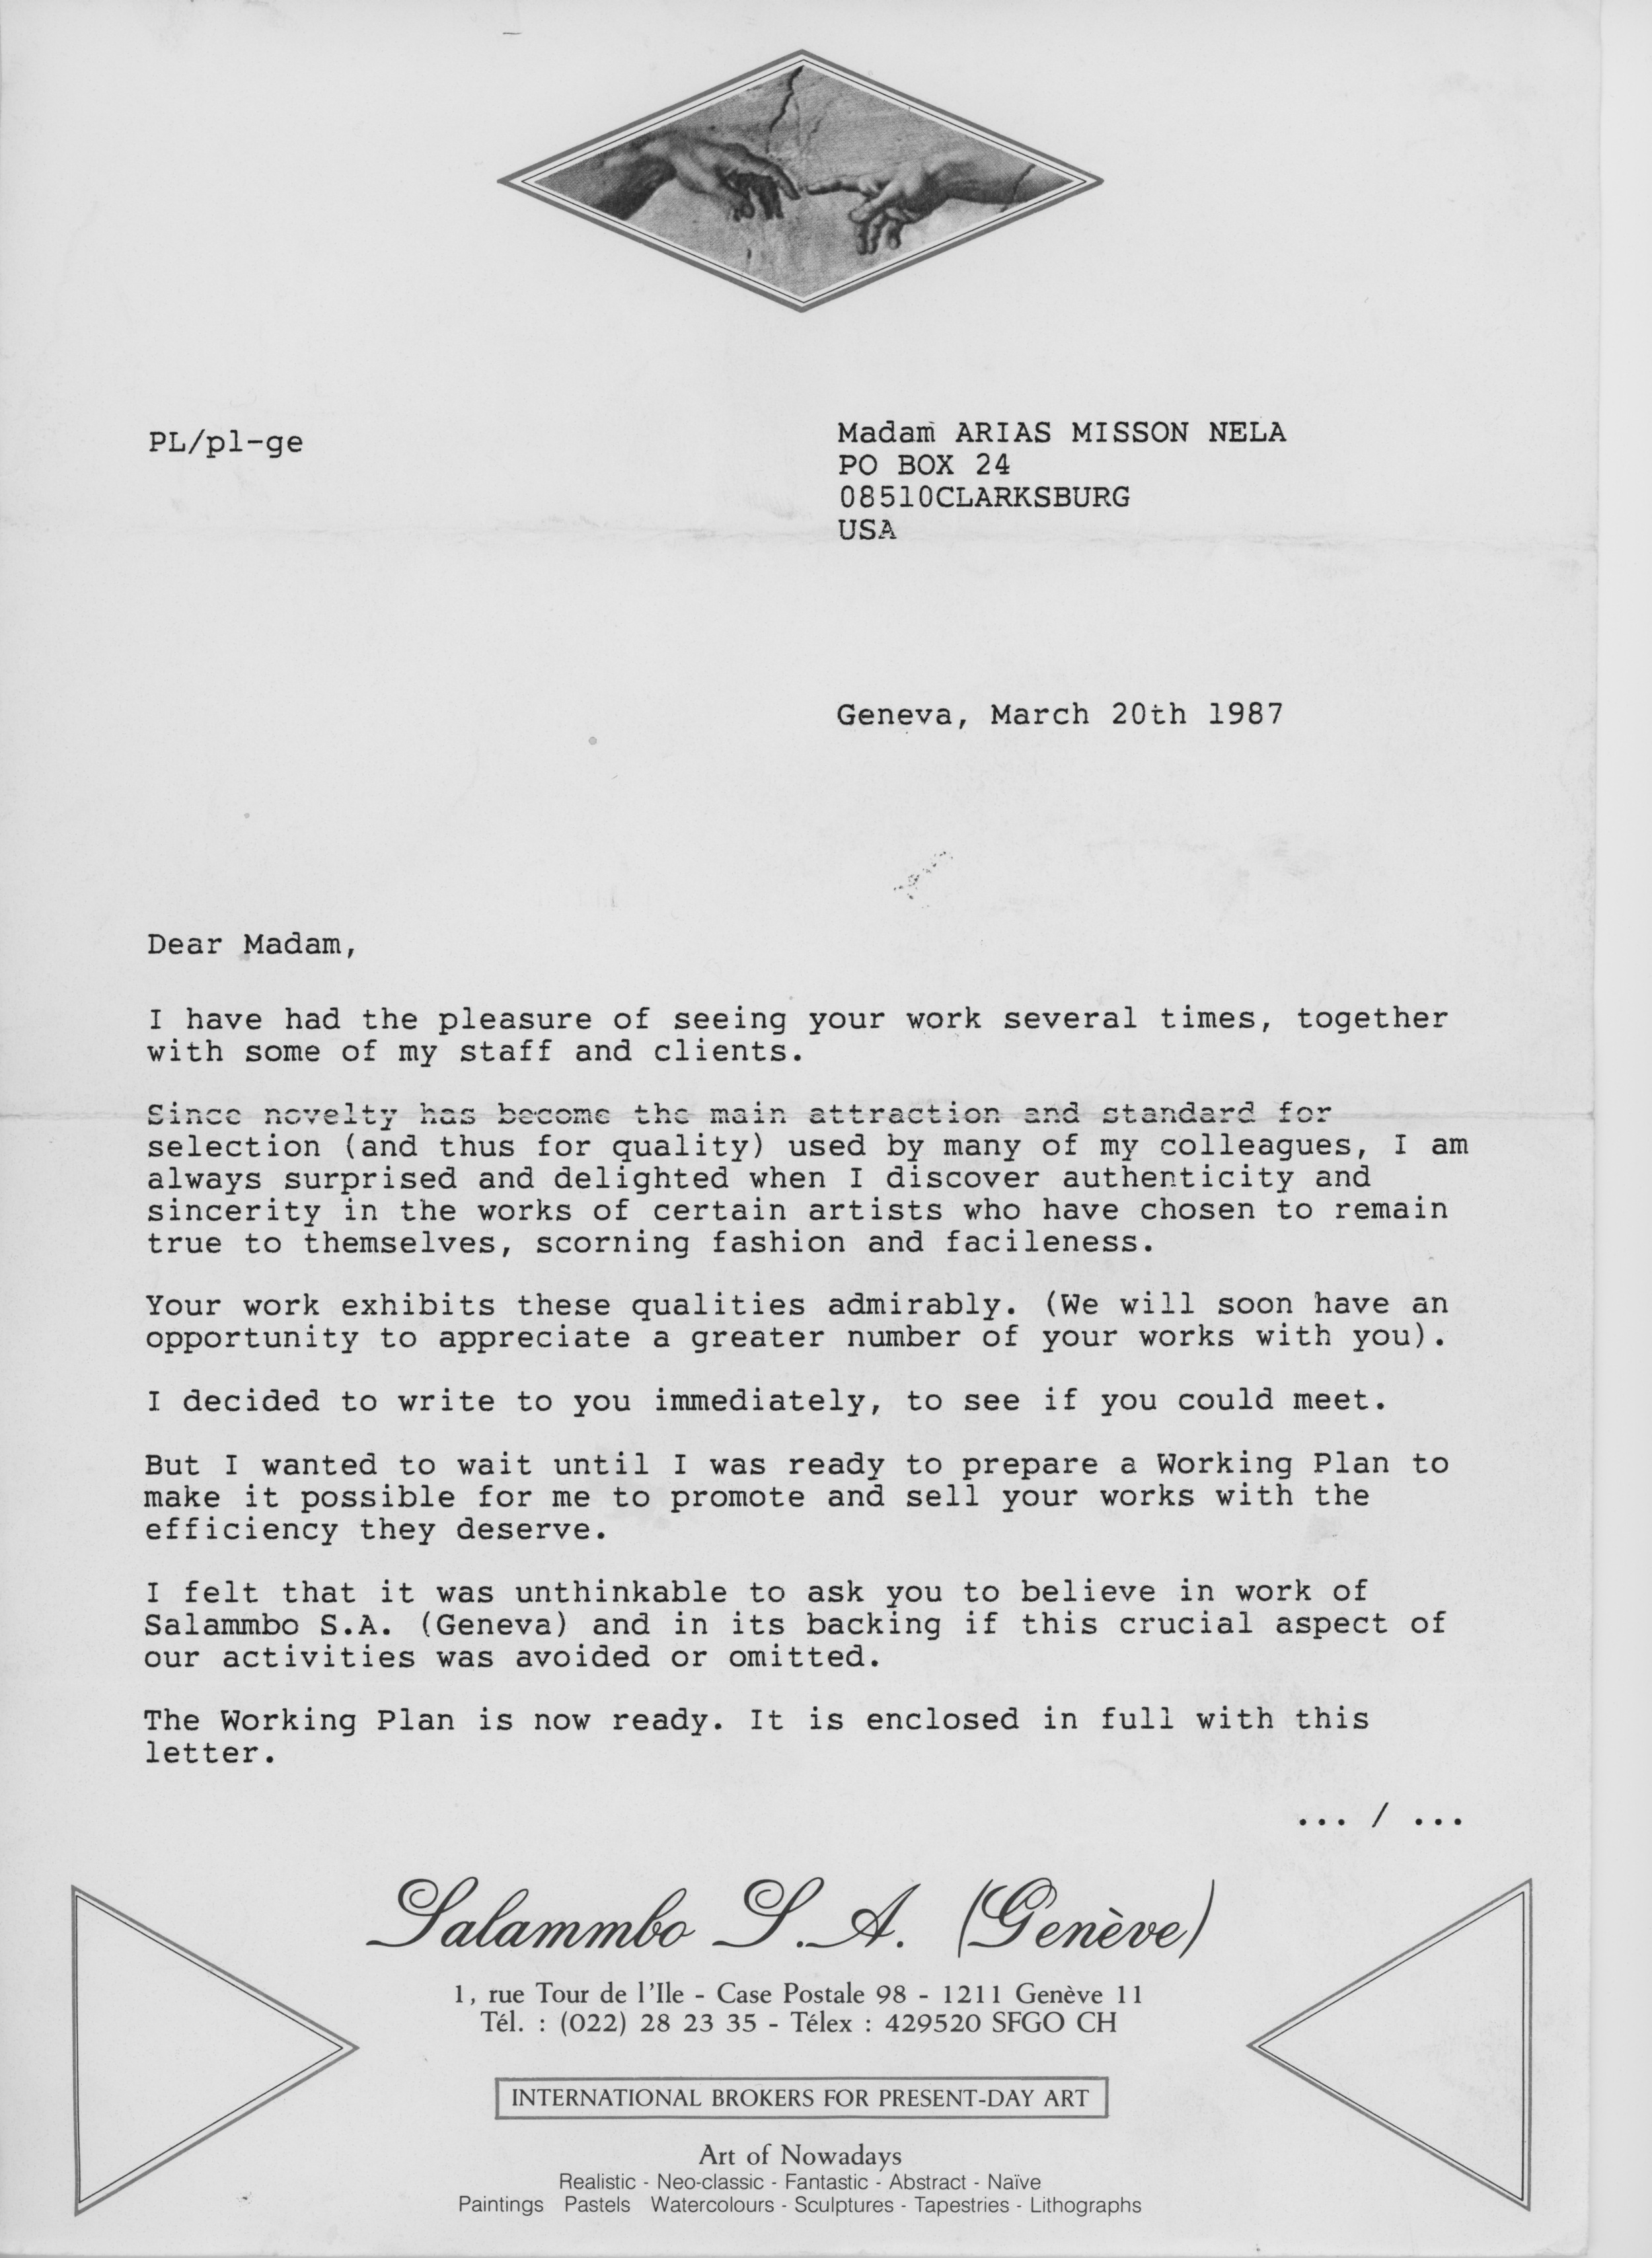 Salammbo Gallery letter to Nela Arias Misson